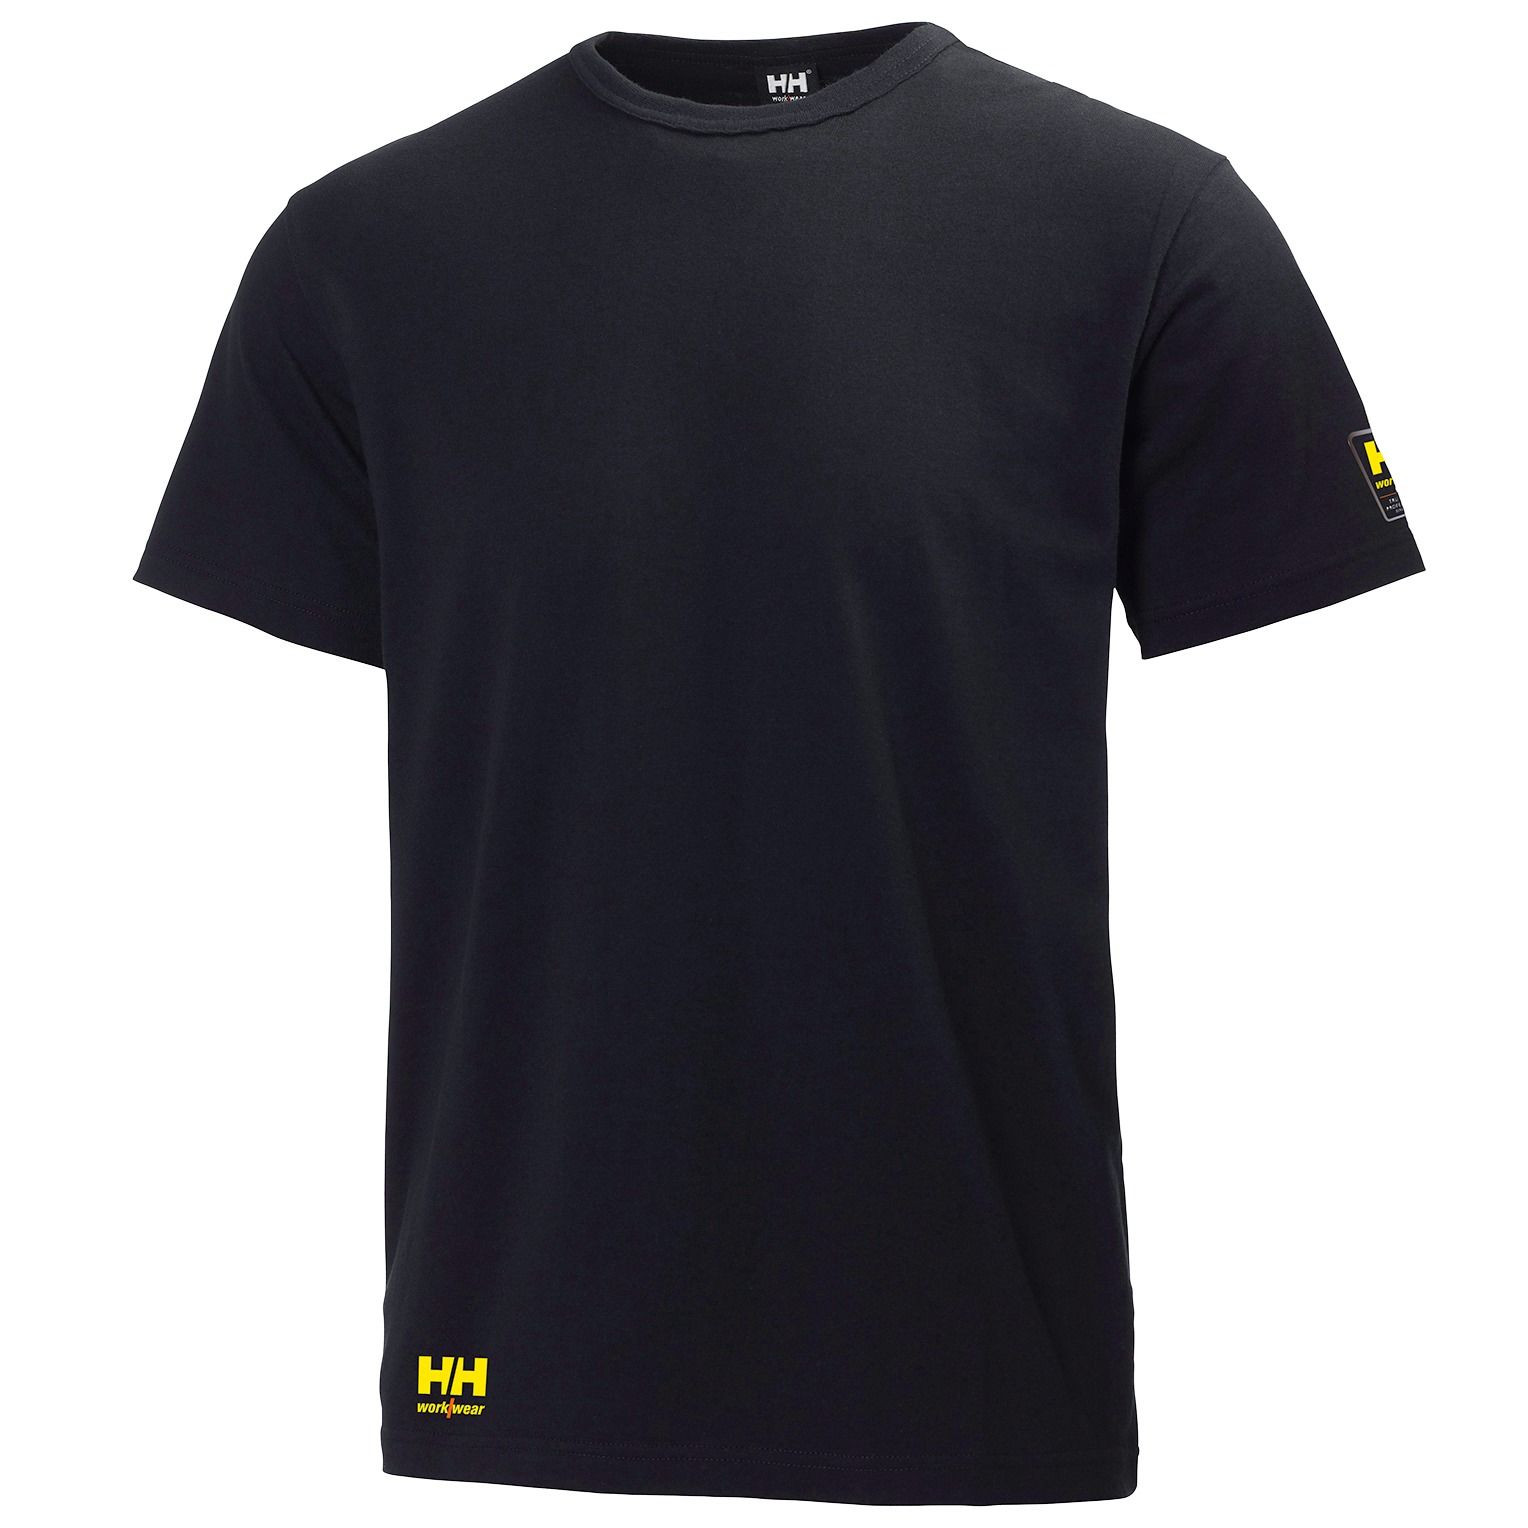 Футболка Helly Hansen Aker Tee - 79160 (Black)